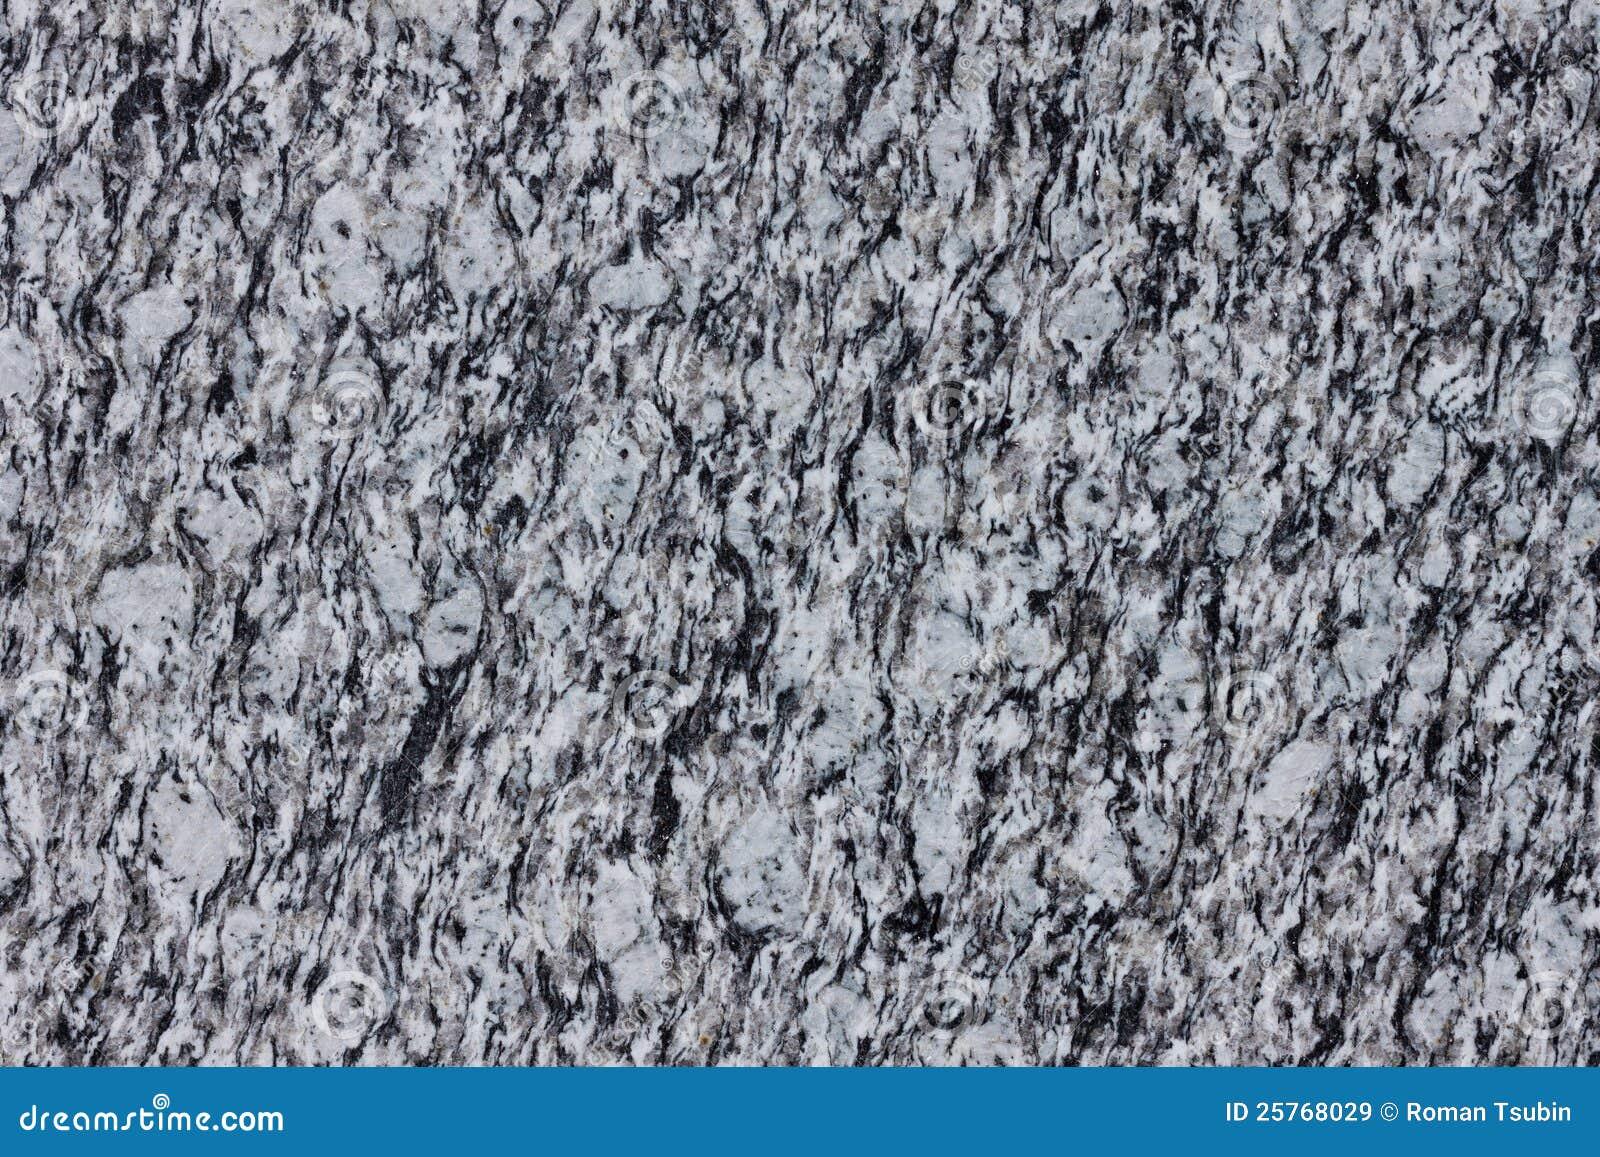 Textura del m rmol gris im genes de archivo libres de for Textura del marmol